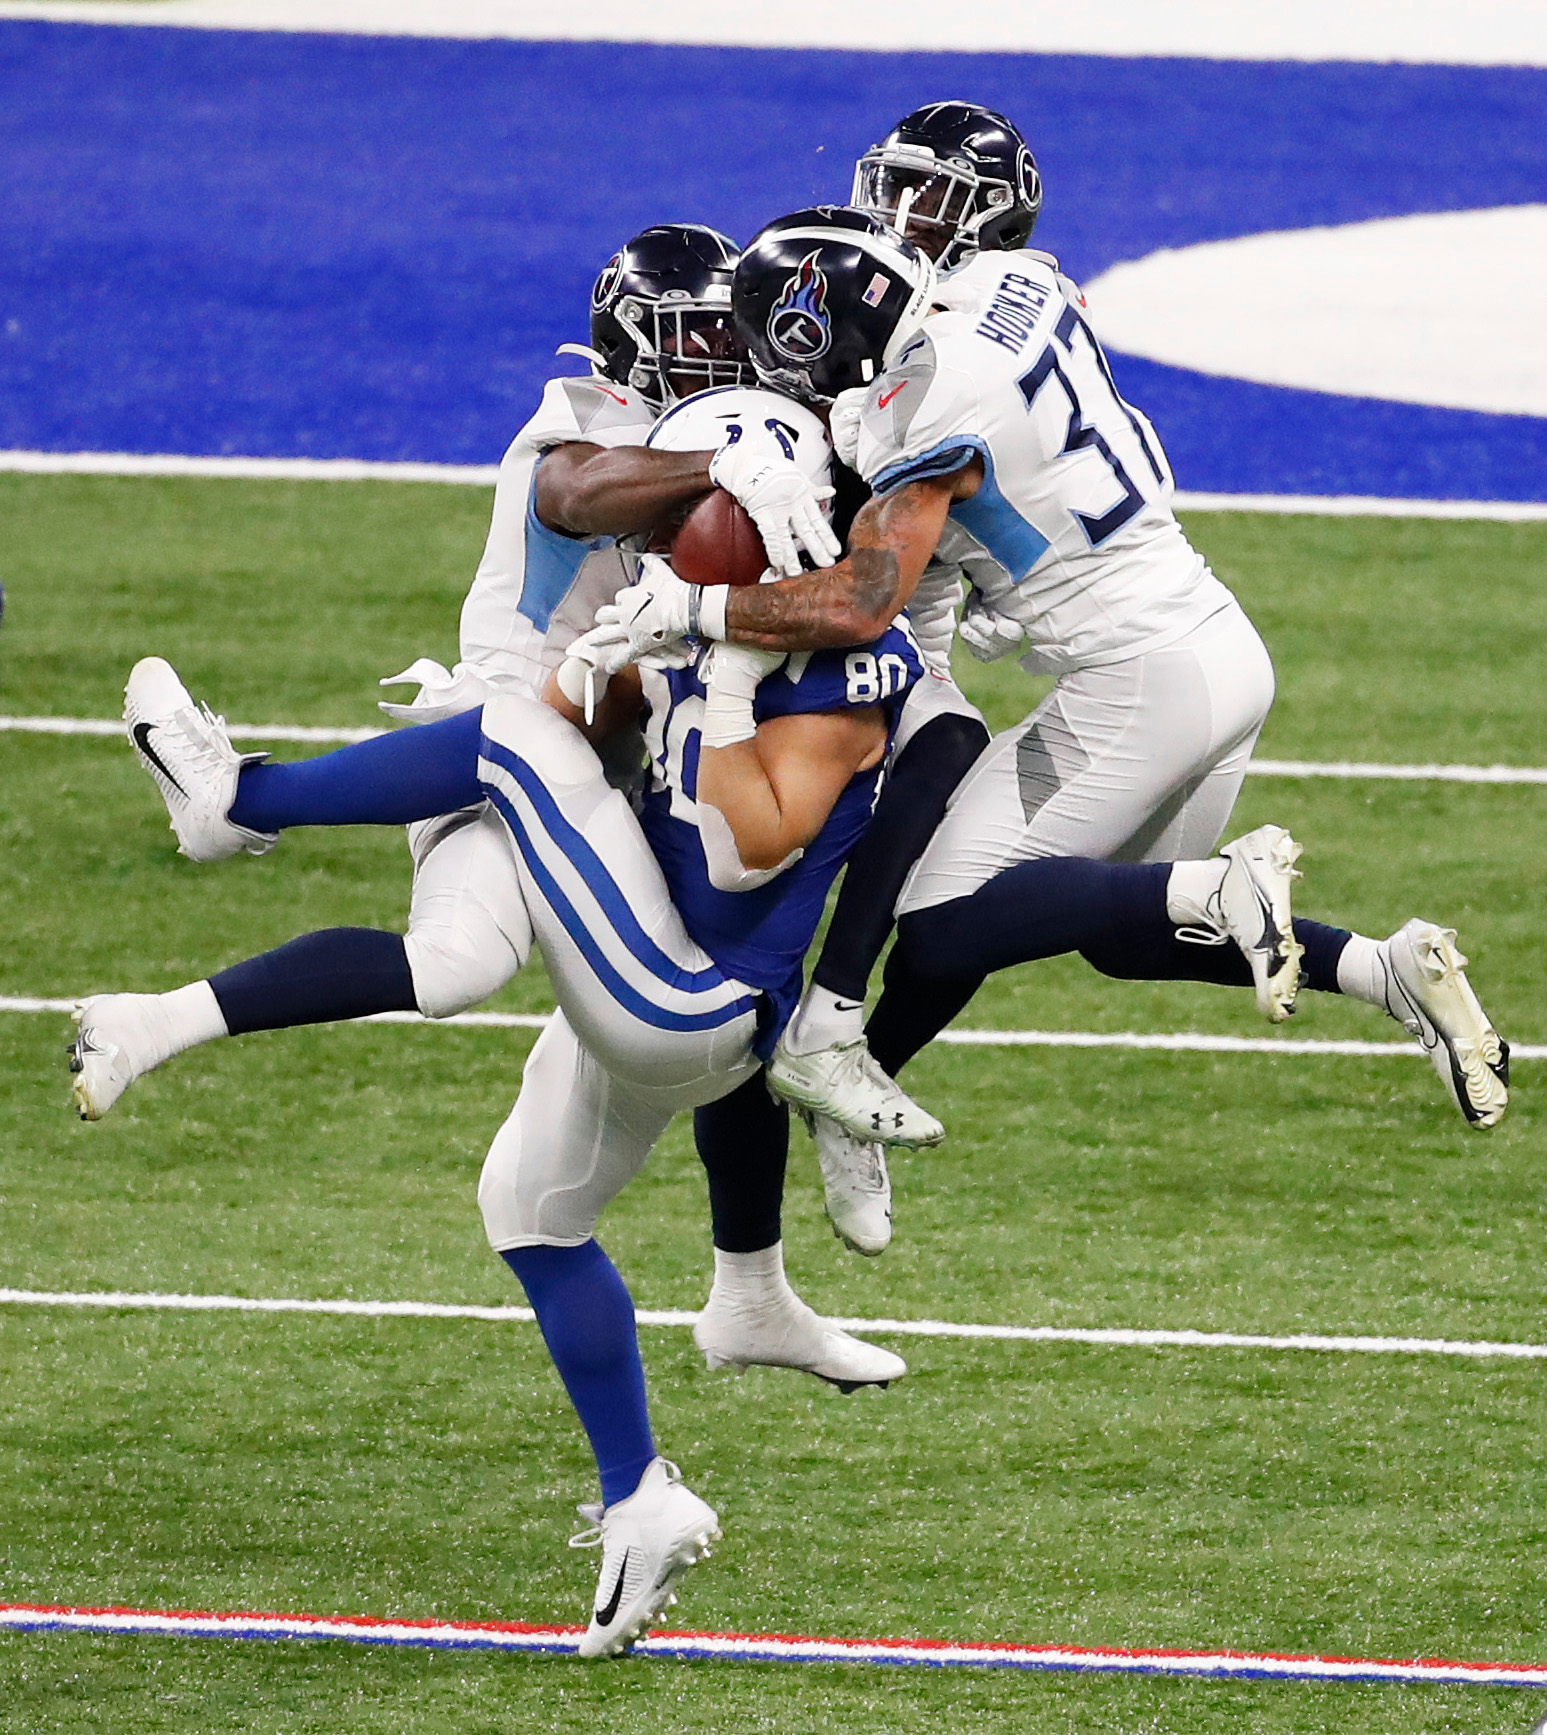 Colts catch